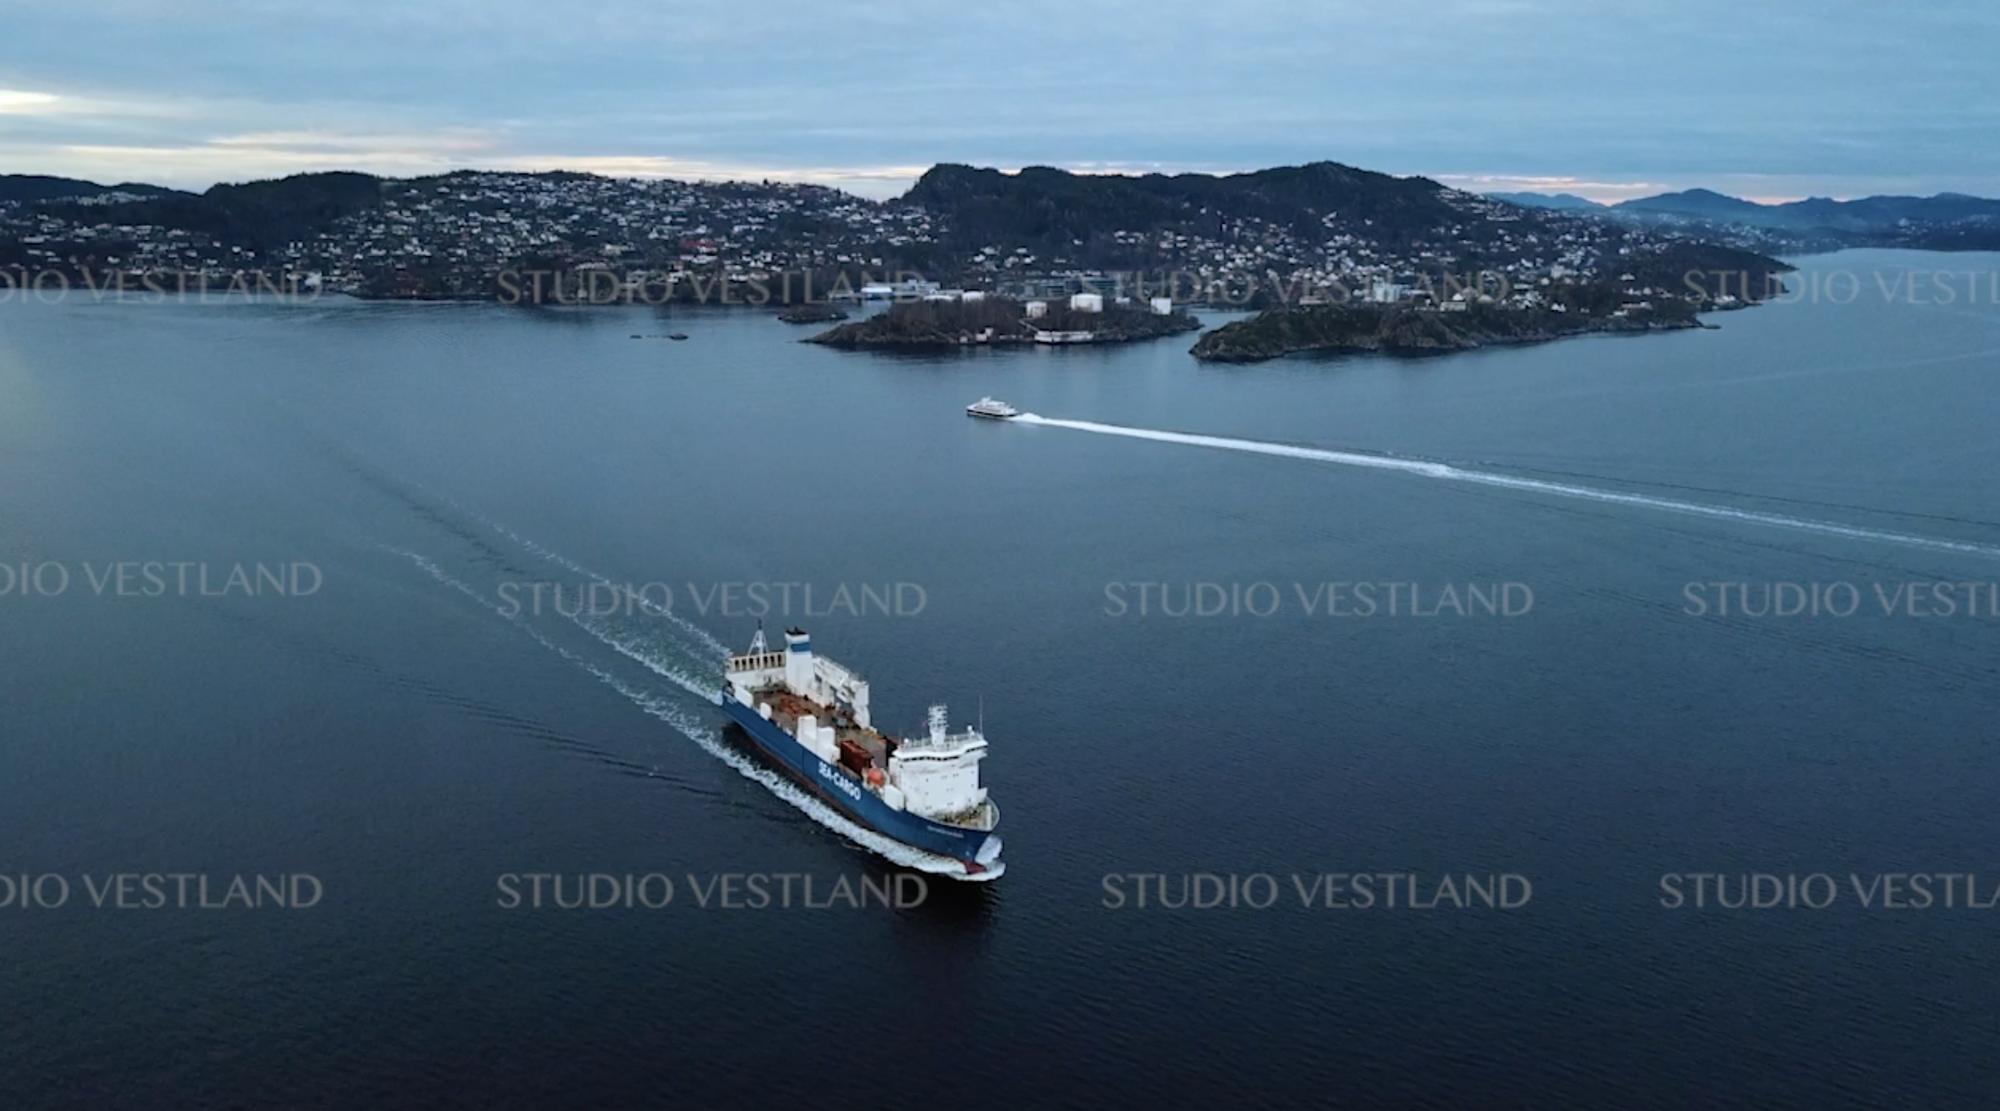 Studio Vestland - Askøy V04